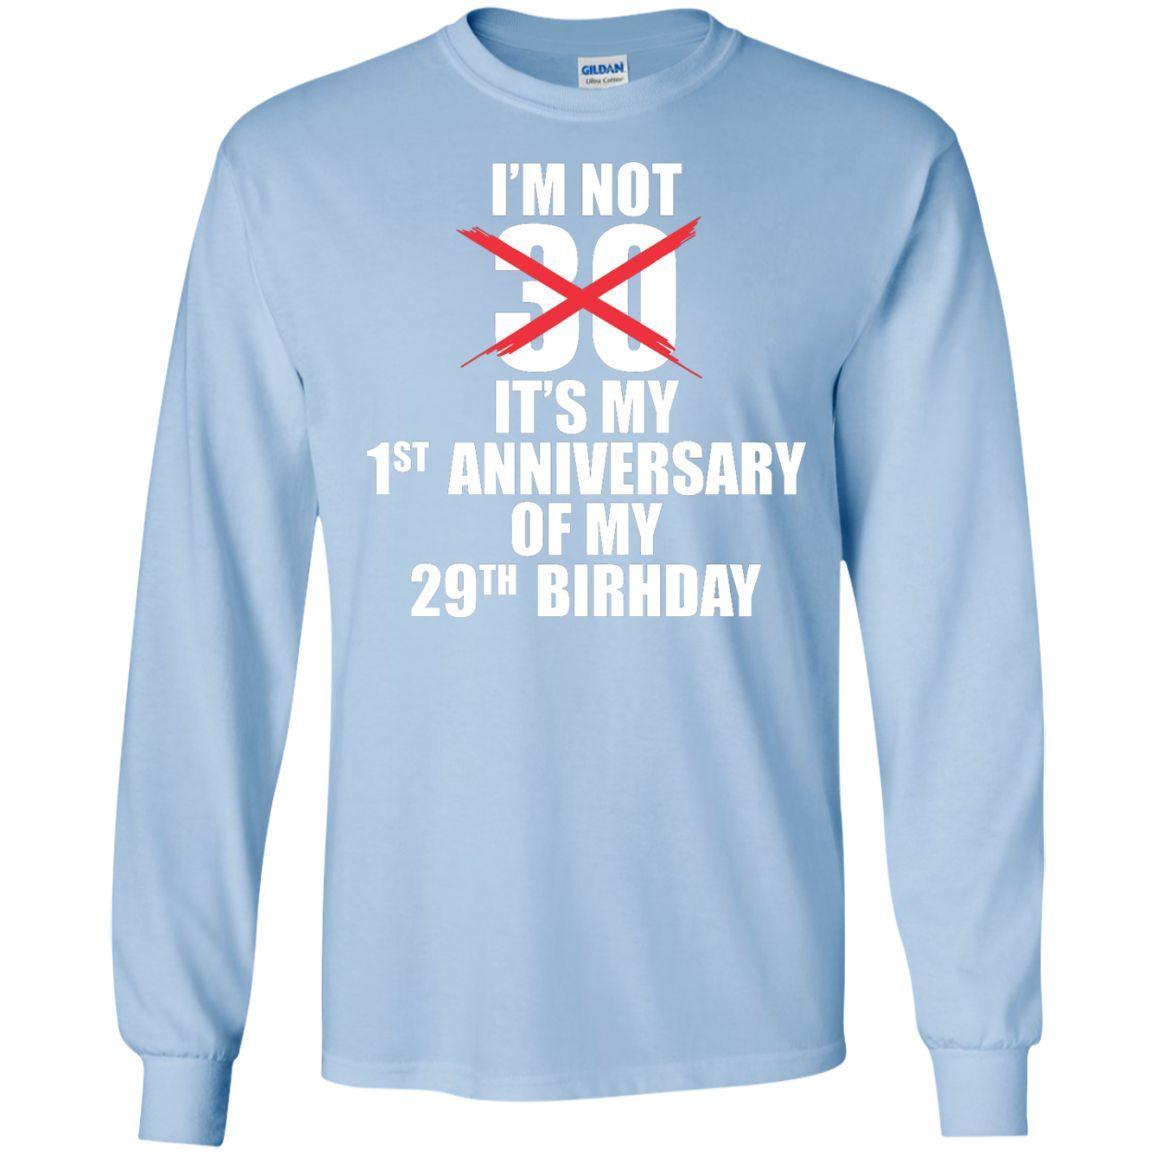 IT'S NOT MY BIRTHDAY! LS Ultra Cotton Tshirt